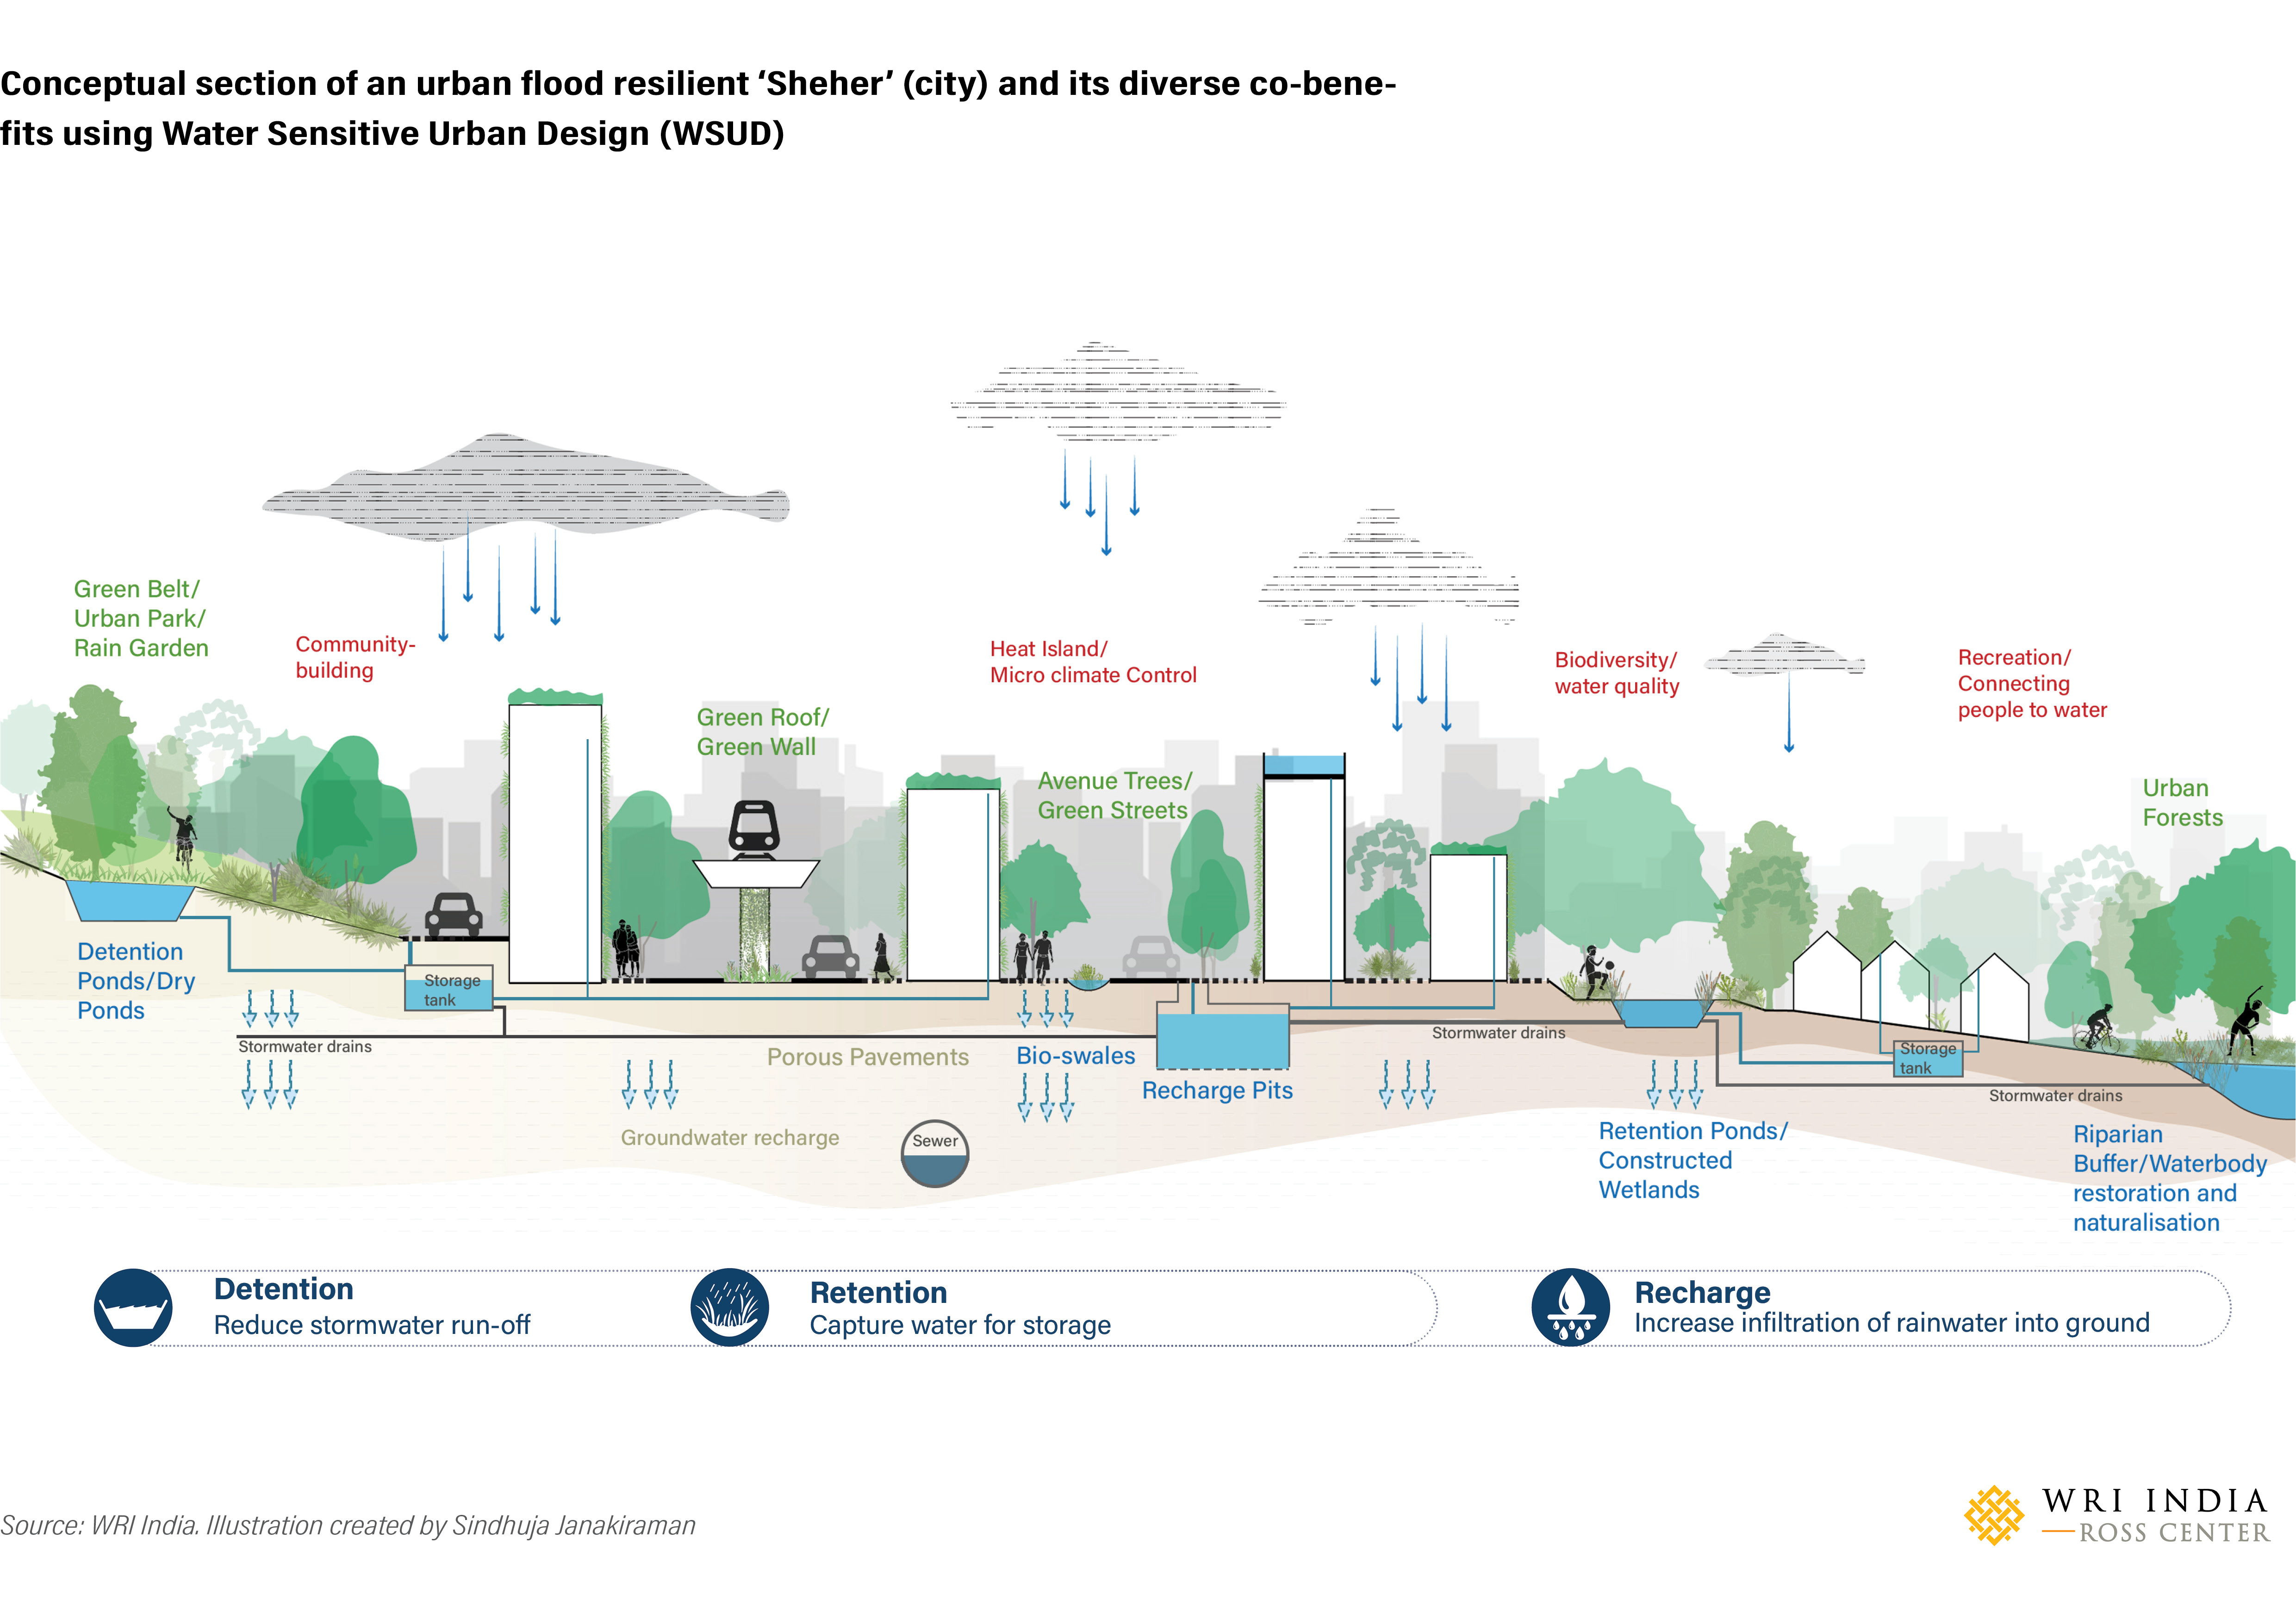 water sensitive urban design (WSUD)